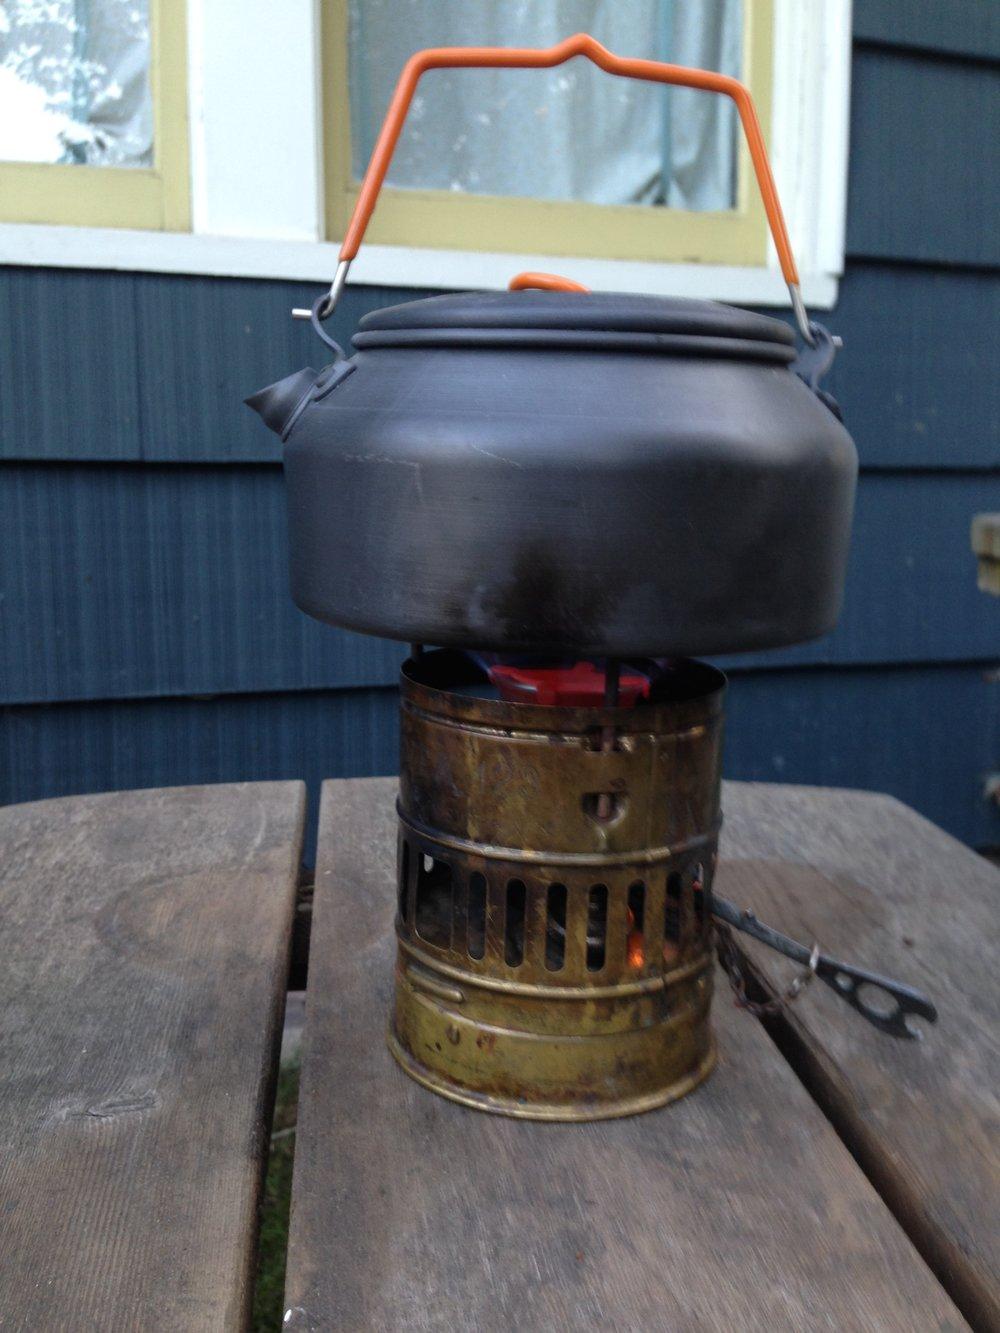 Testing out the Svea stove.